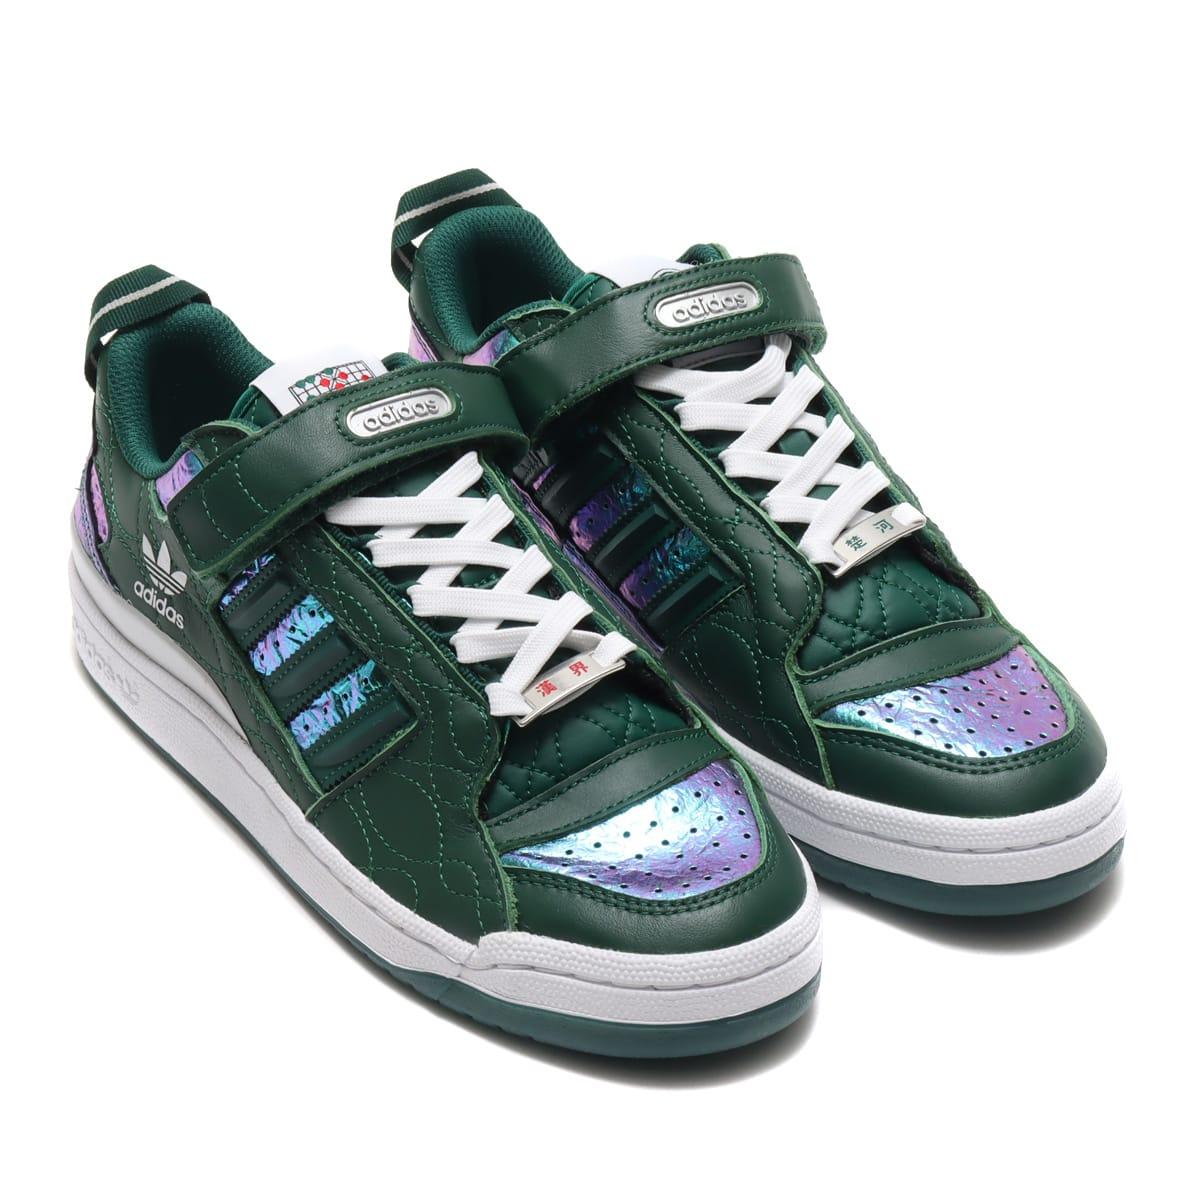 adidas FORUM LOW DARK GREEN/DARK GREEN/FOOTWEAR WHITE 20FW-S_photo_large